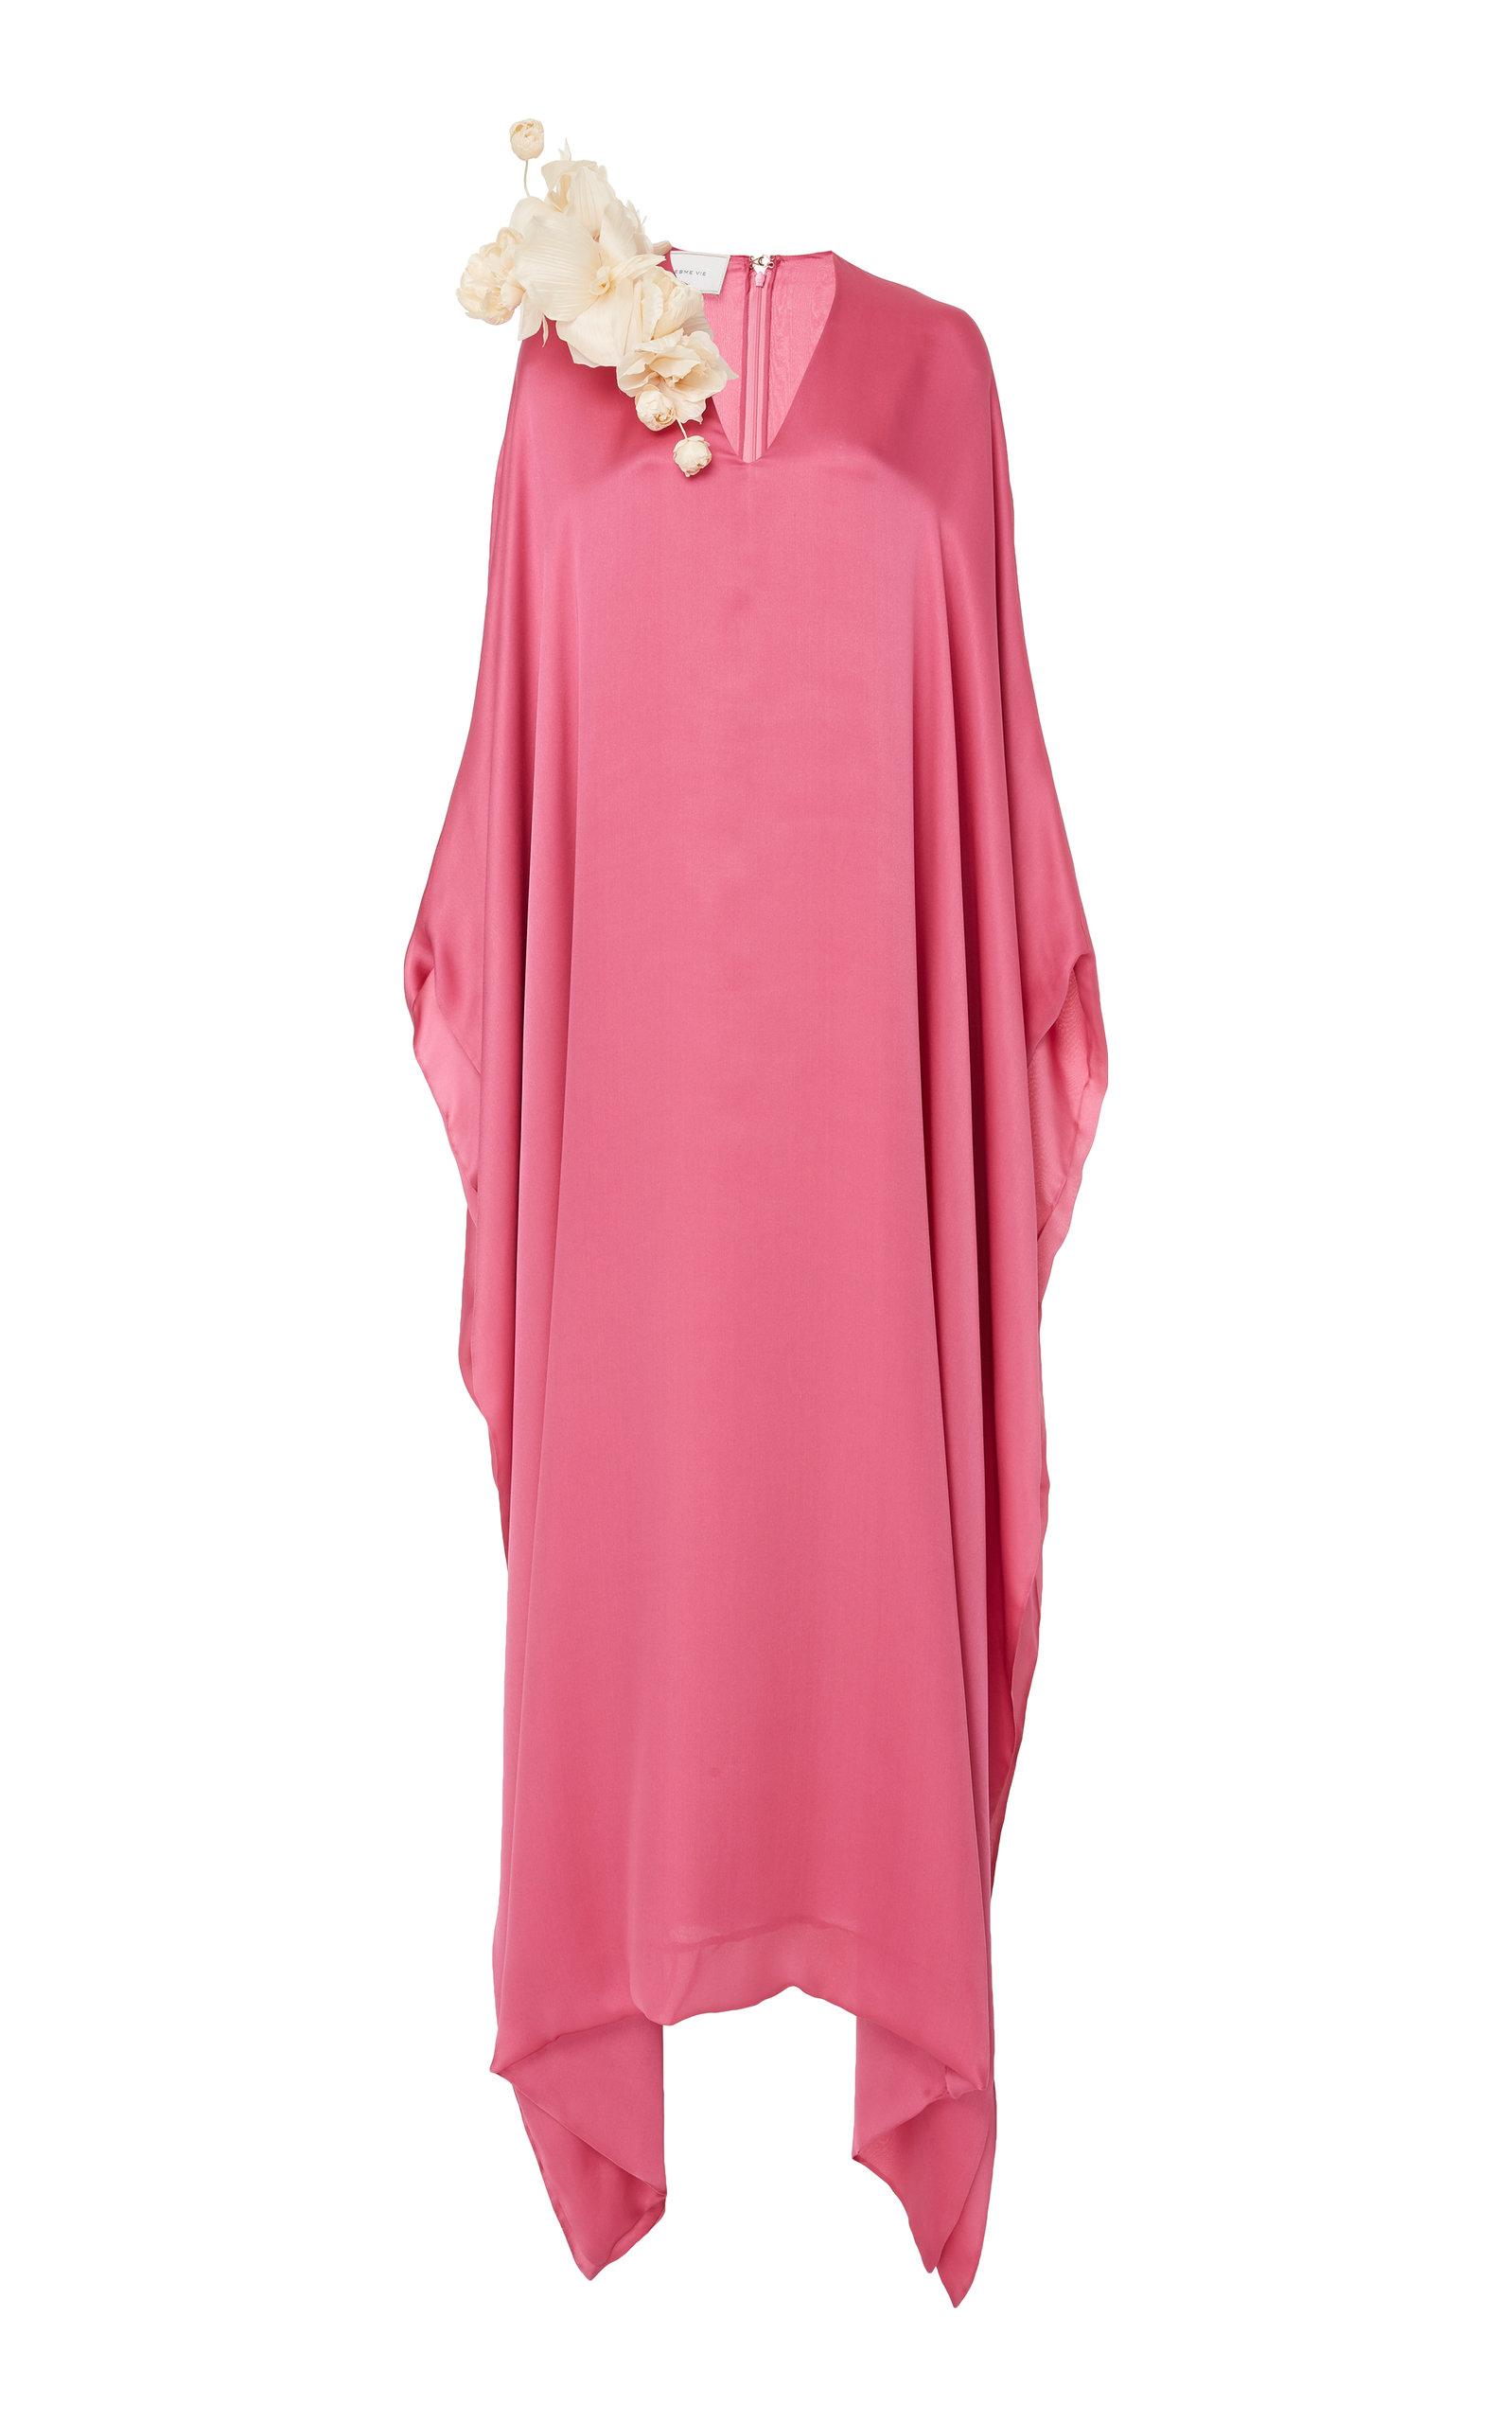 ESME VIE M'O Exclusive Floral-Appliquéd Silk-Satin Kaftan in Pink